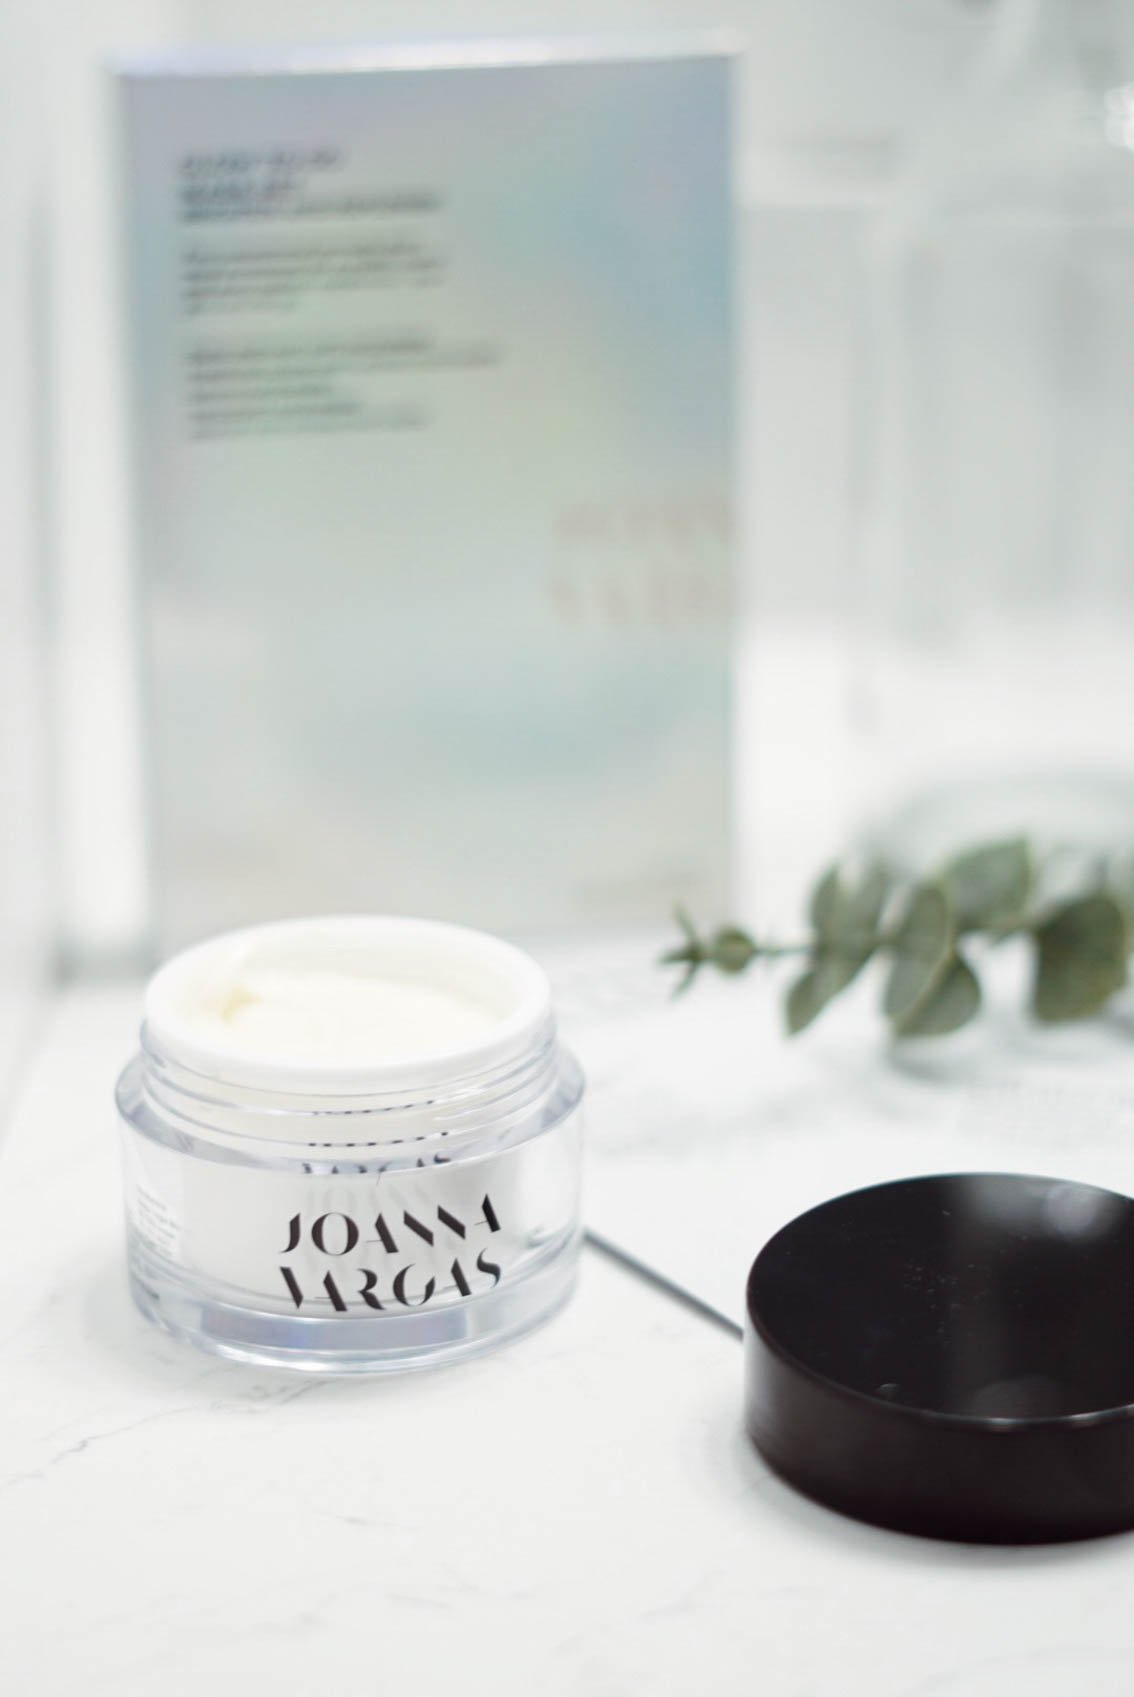 Joanna Vargas Skincare Review